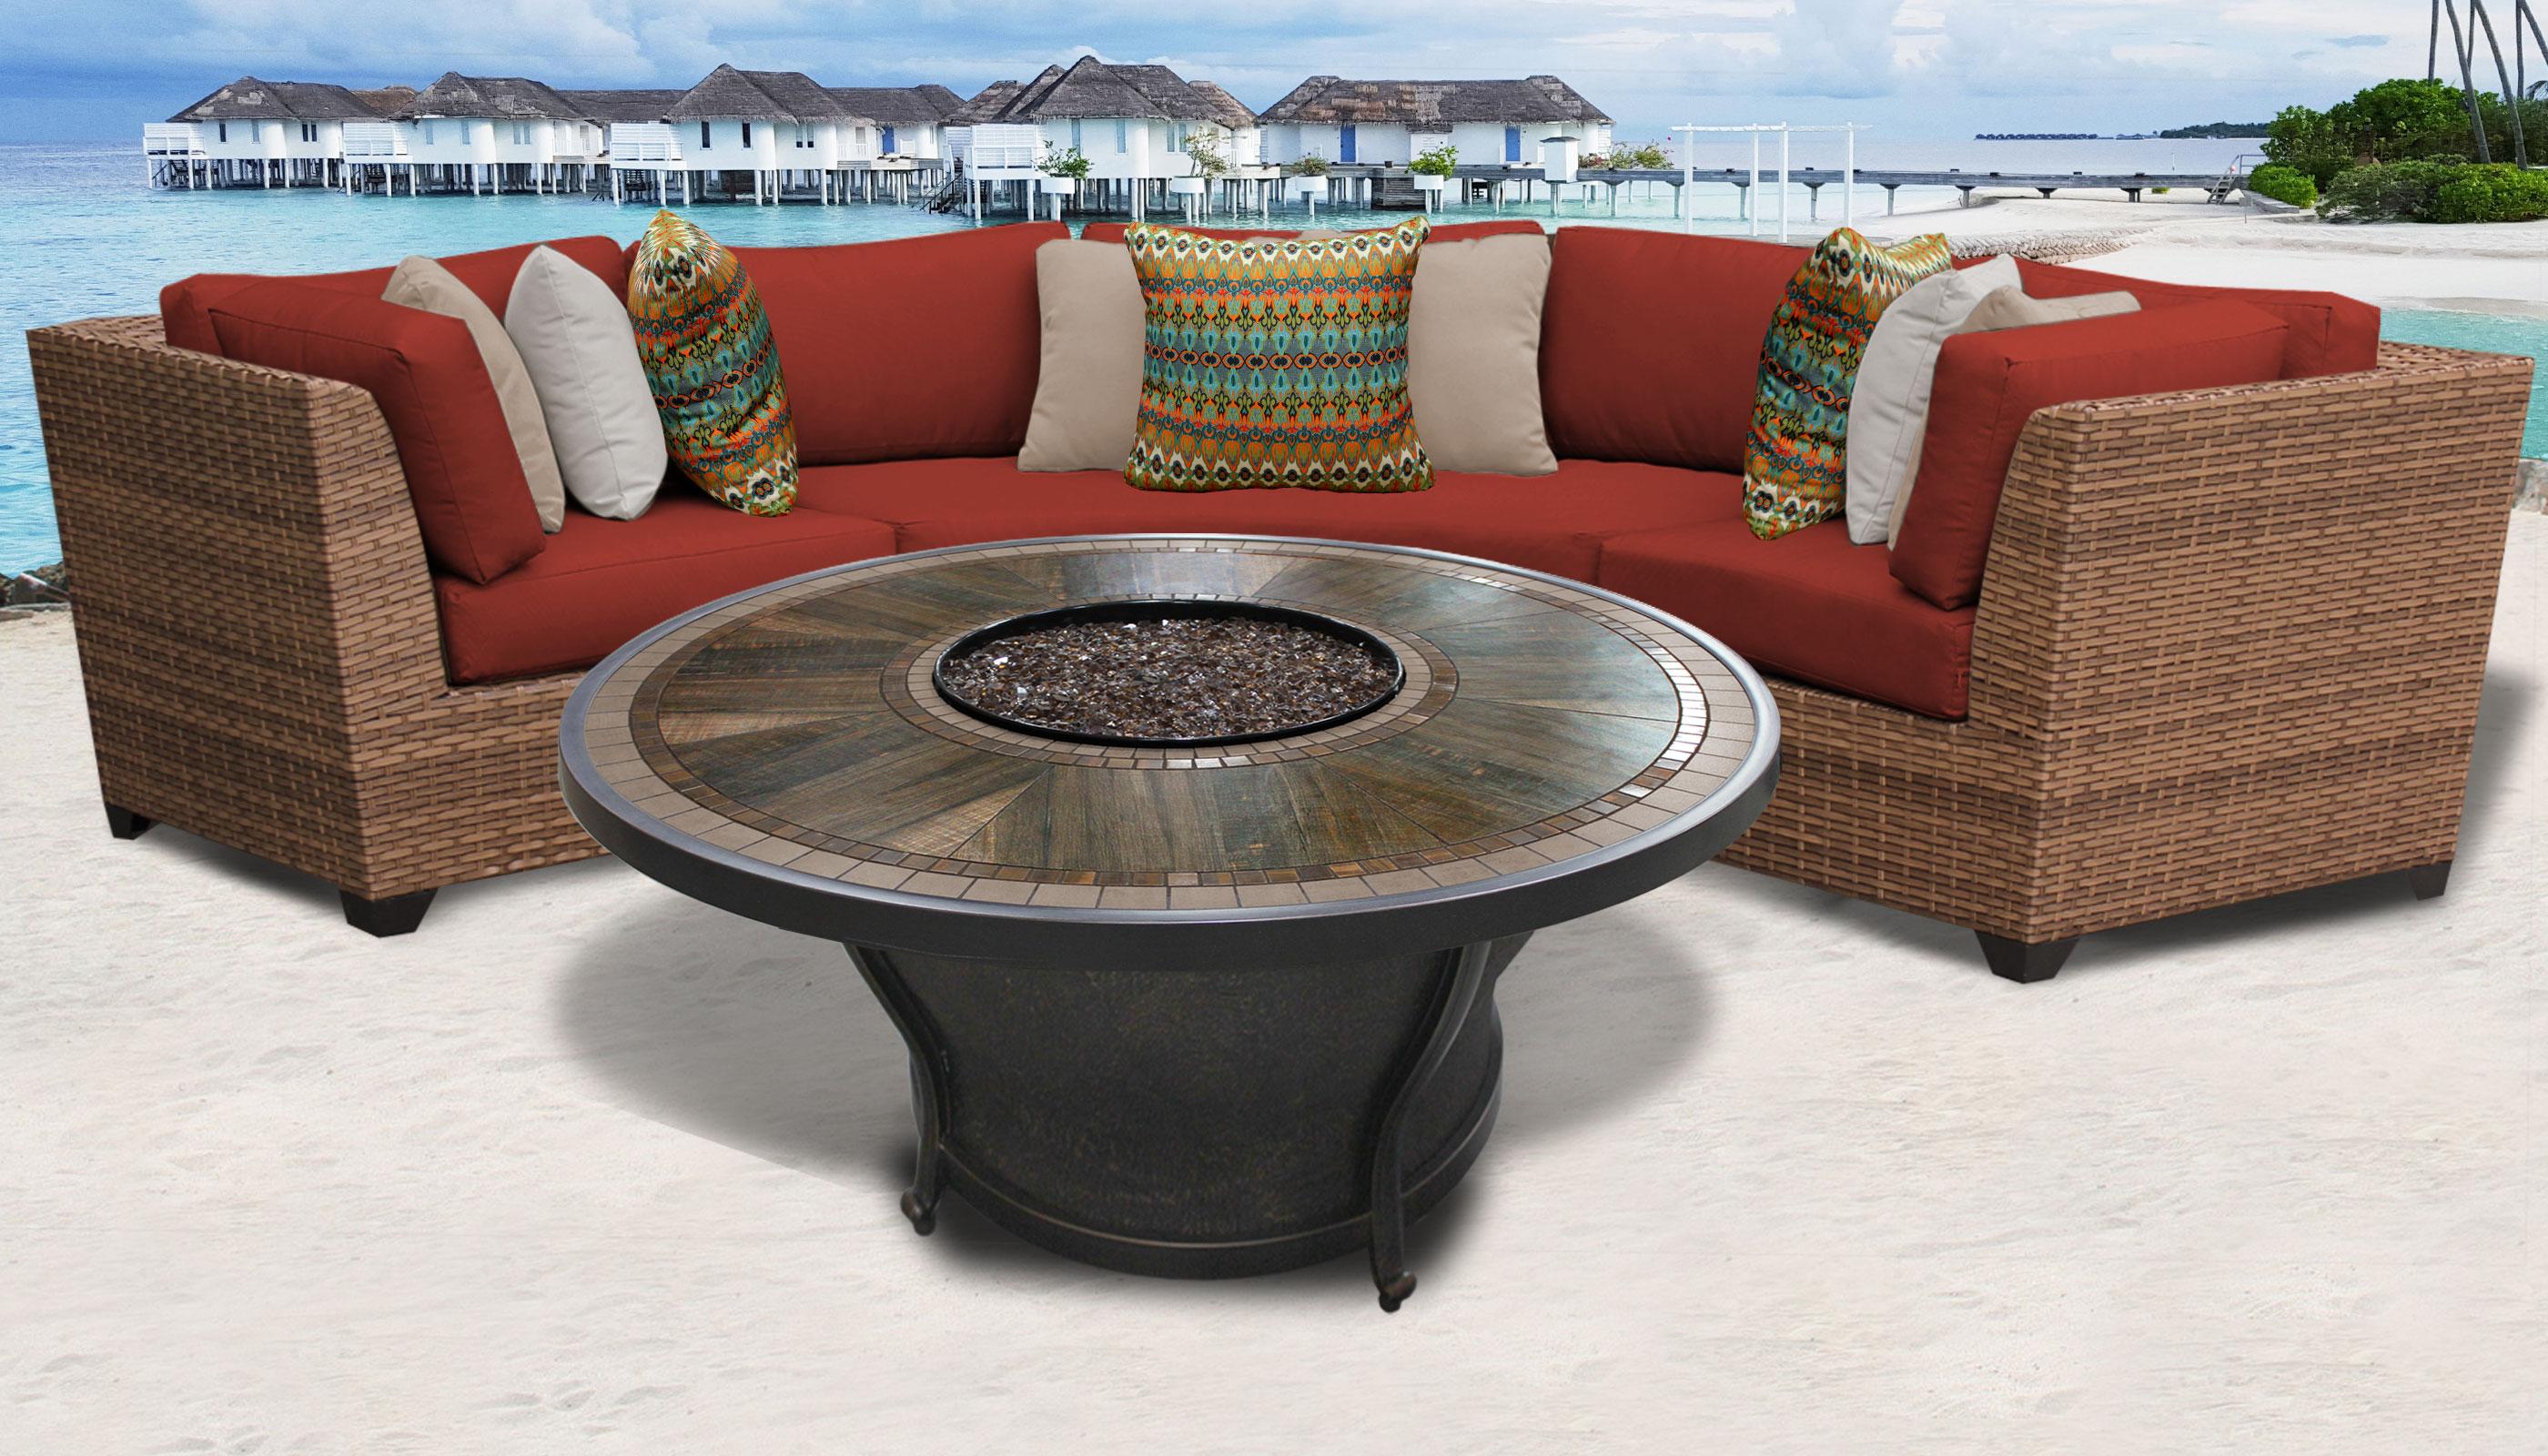 Laguna 4 Piece Outdoor Wicker Patio Furniture Set 04h